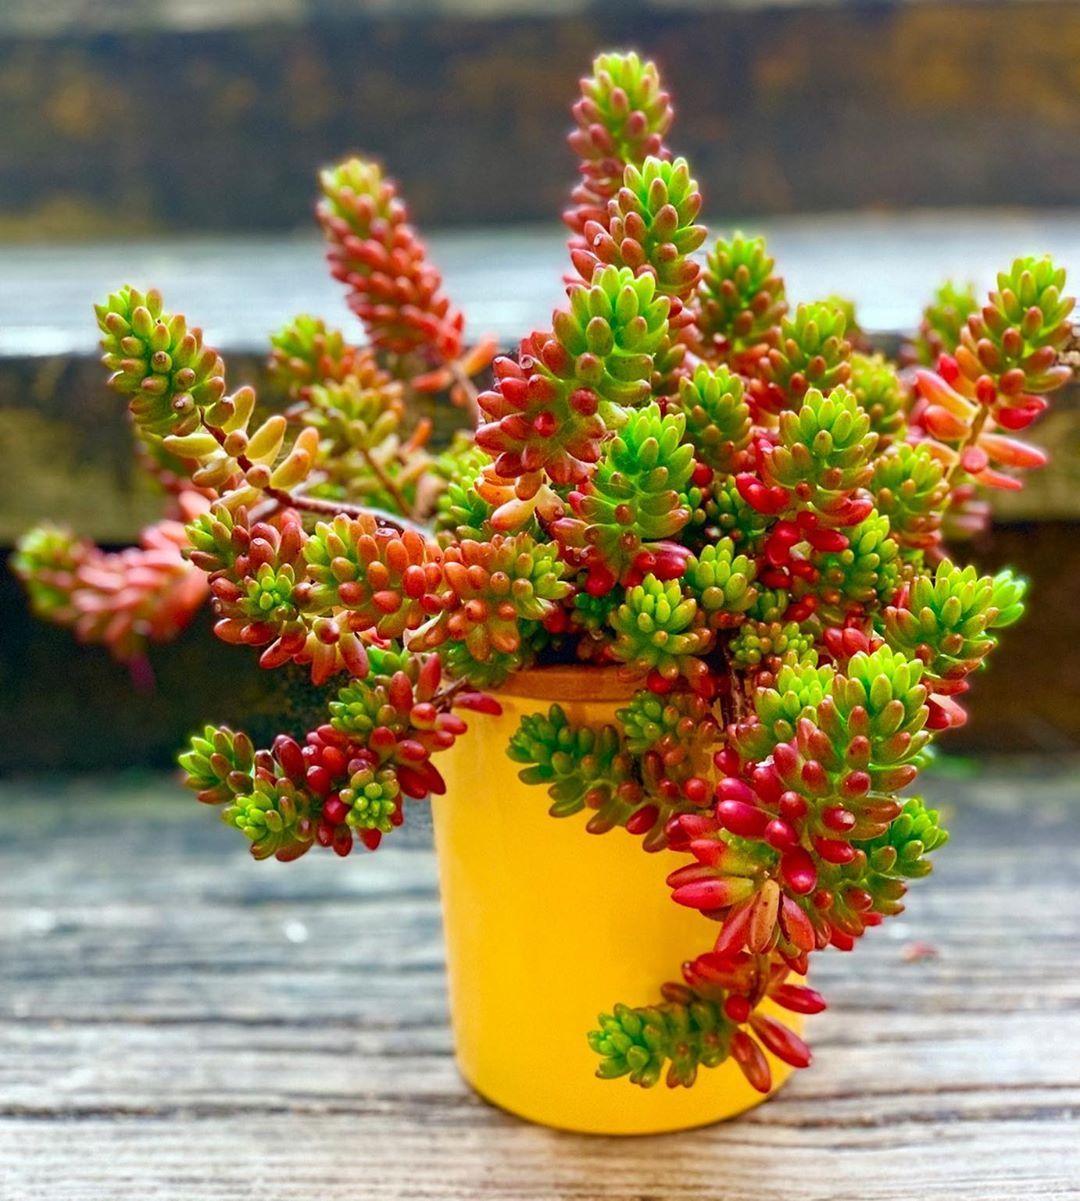 Pink Jelly Bean Sedum Repost Thriftysucculents Succulents